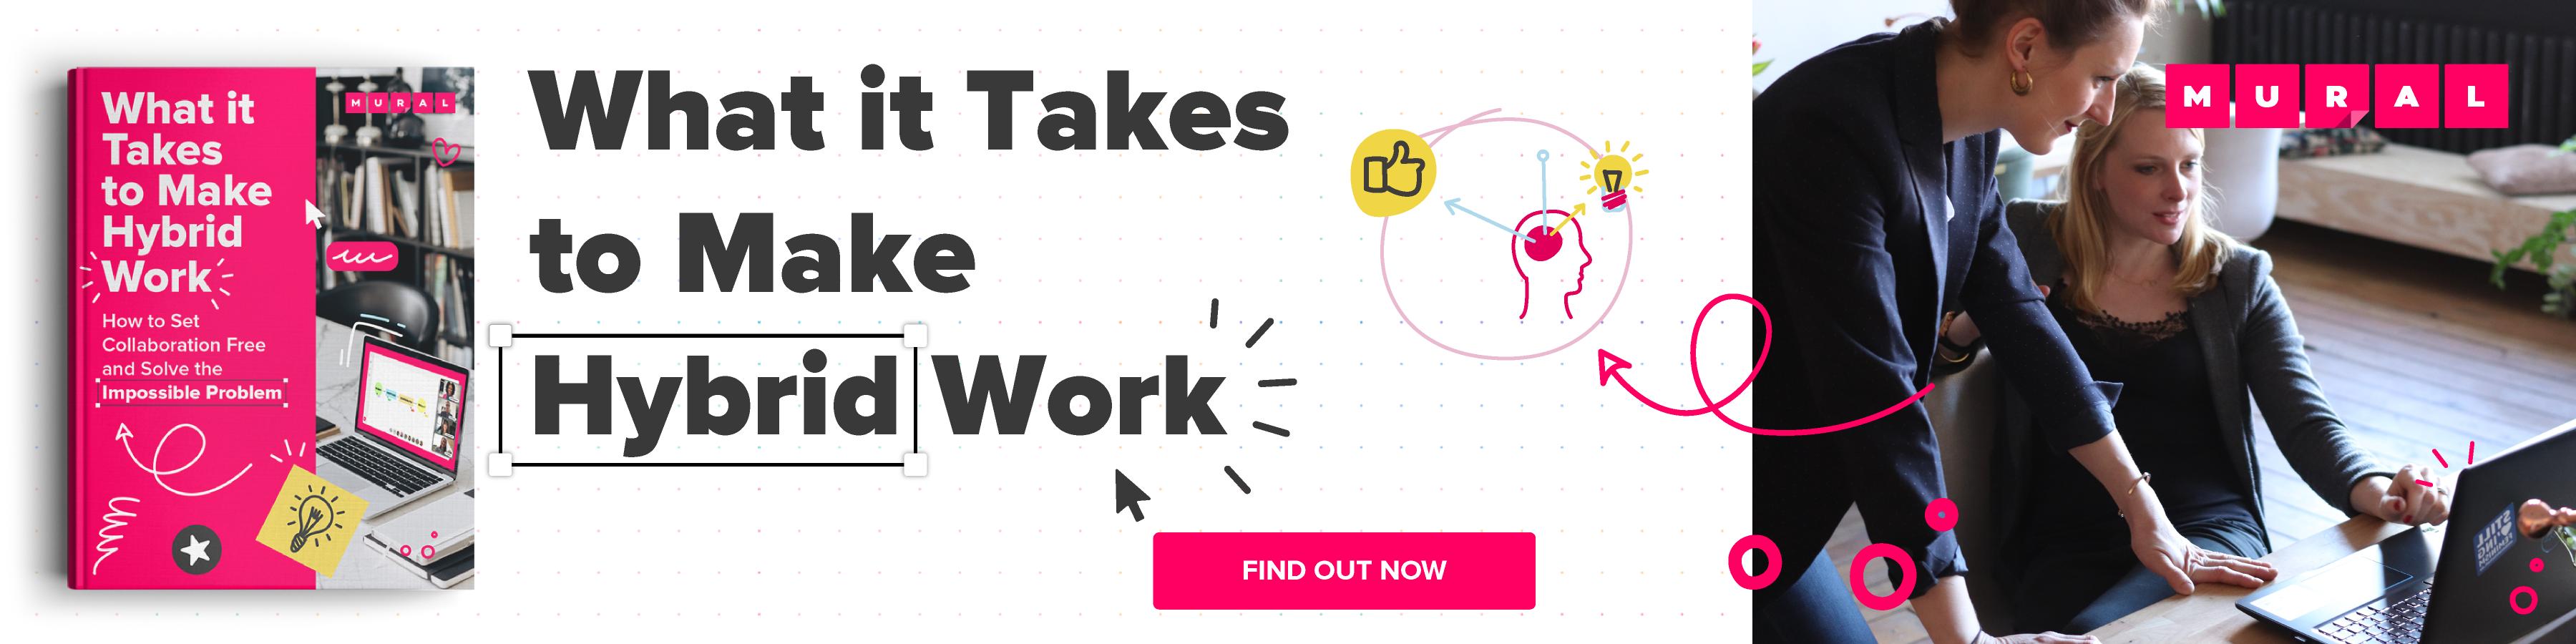 What it takes to make hybrid work pdf